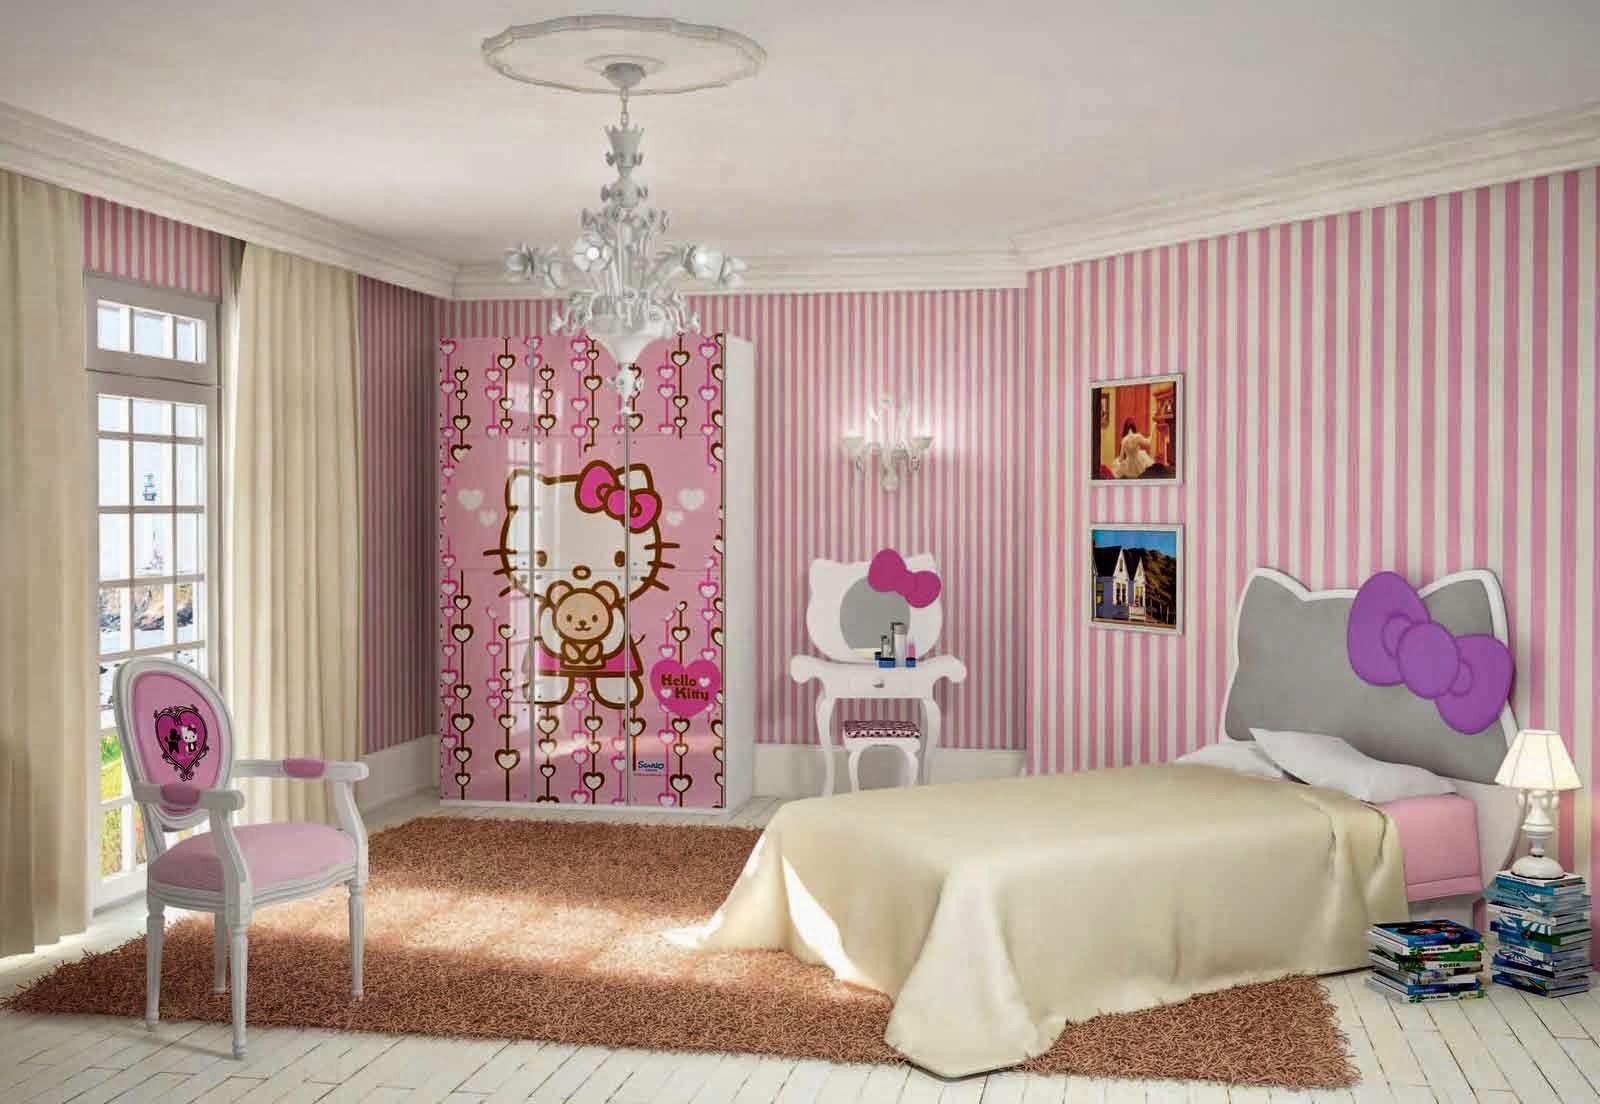 Bedroom Interior Design Hello Kitty 2015 Home Inspirations